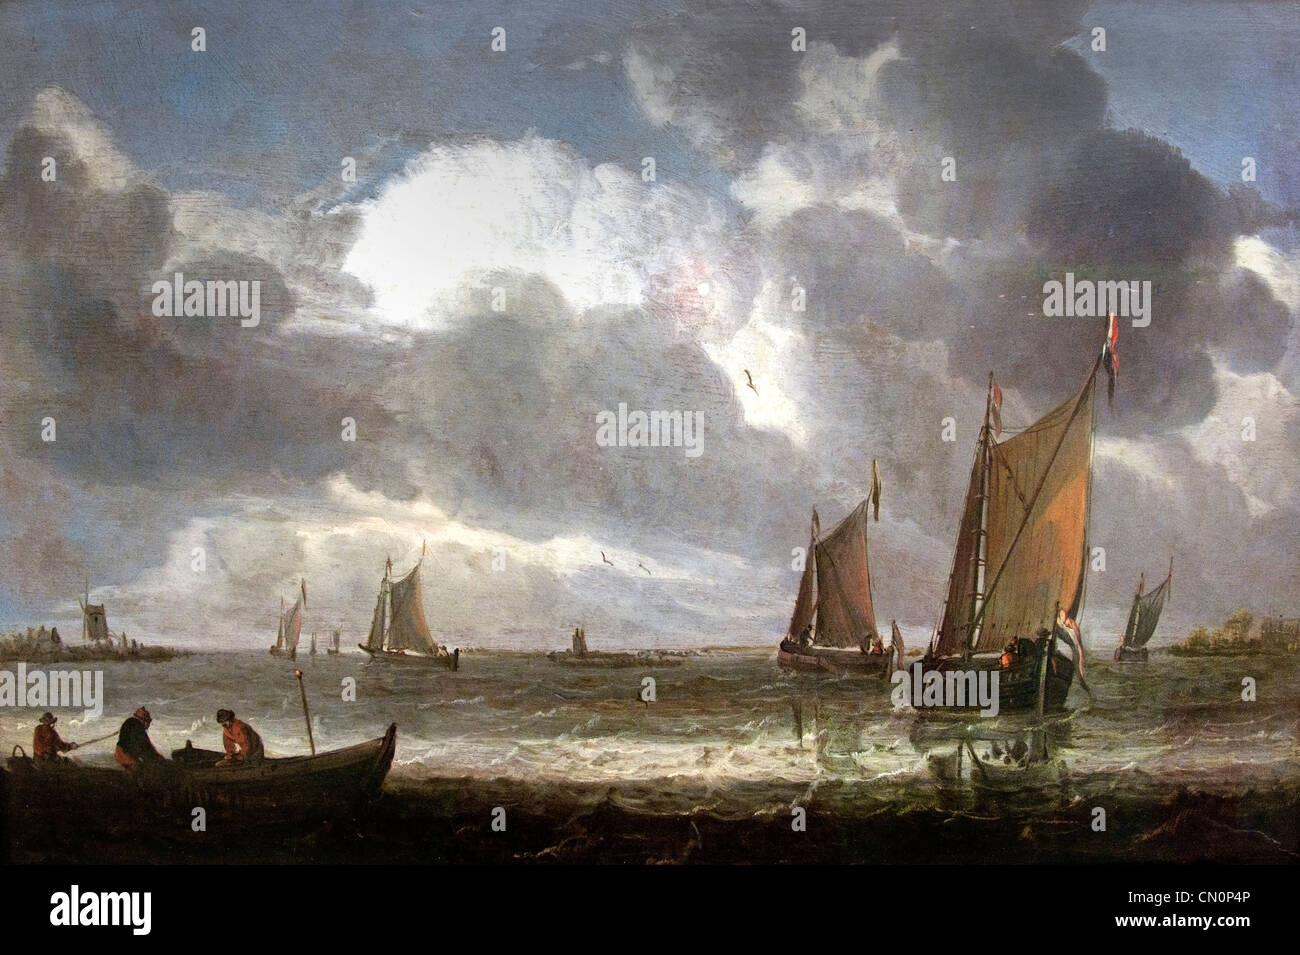 La Marine d'argent - Navy money 1640 by  Abraham van Beyeren Dutch Netherlands - Stock Image